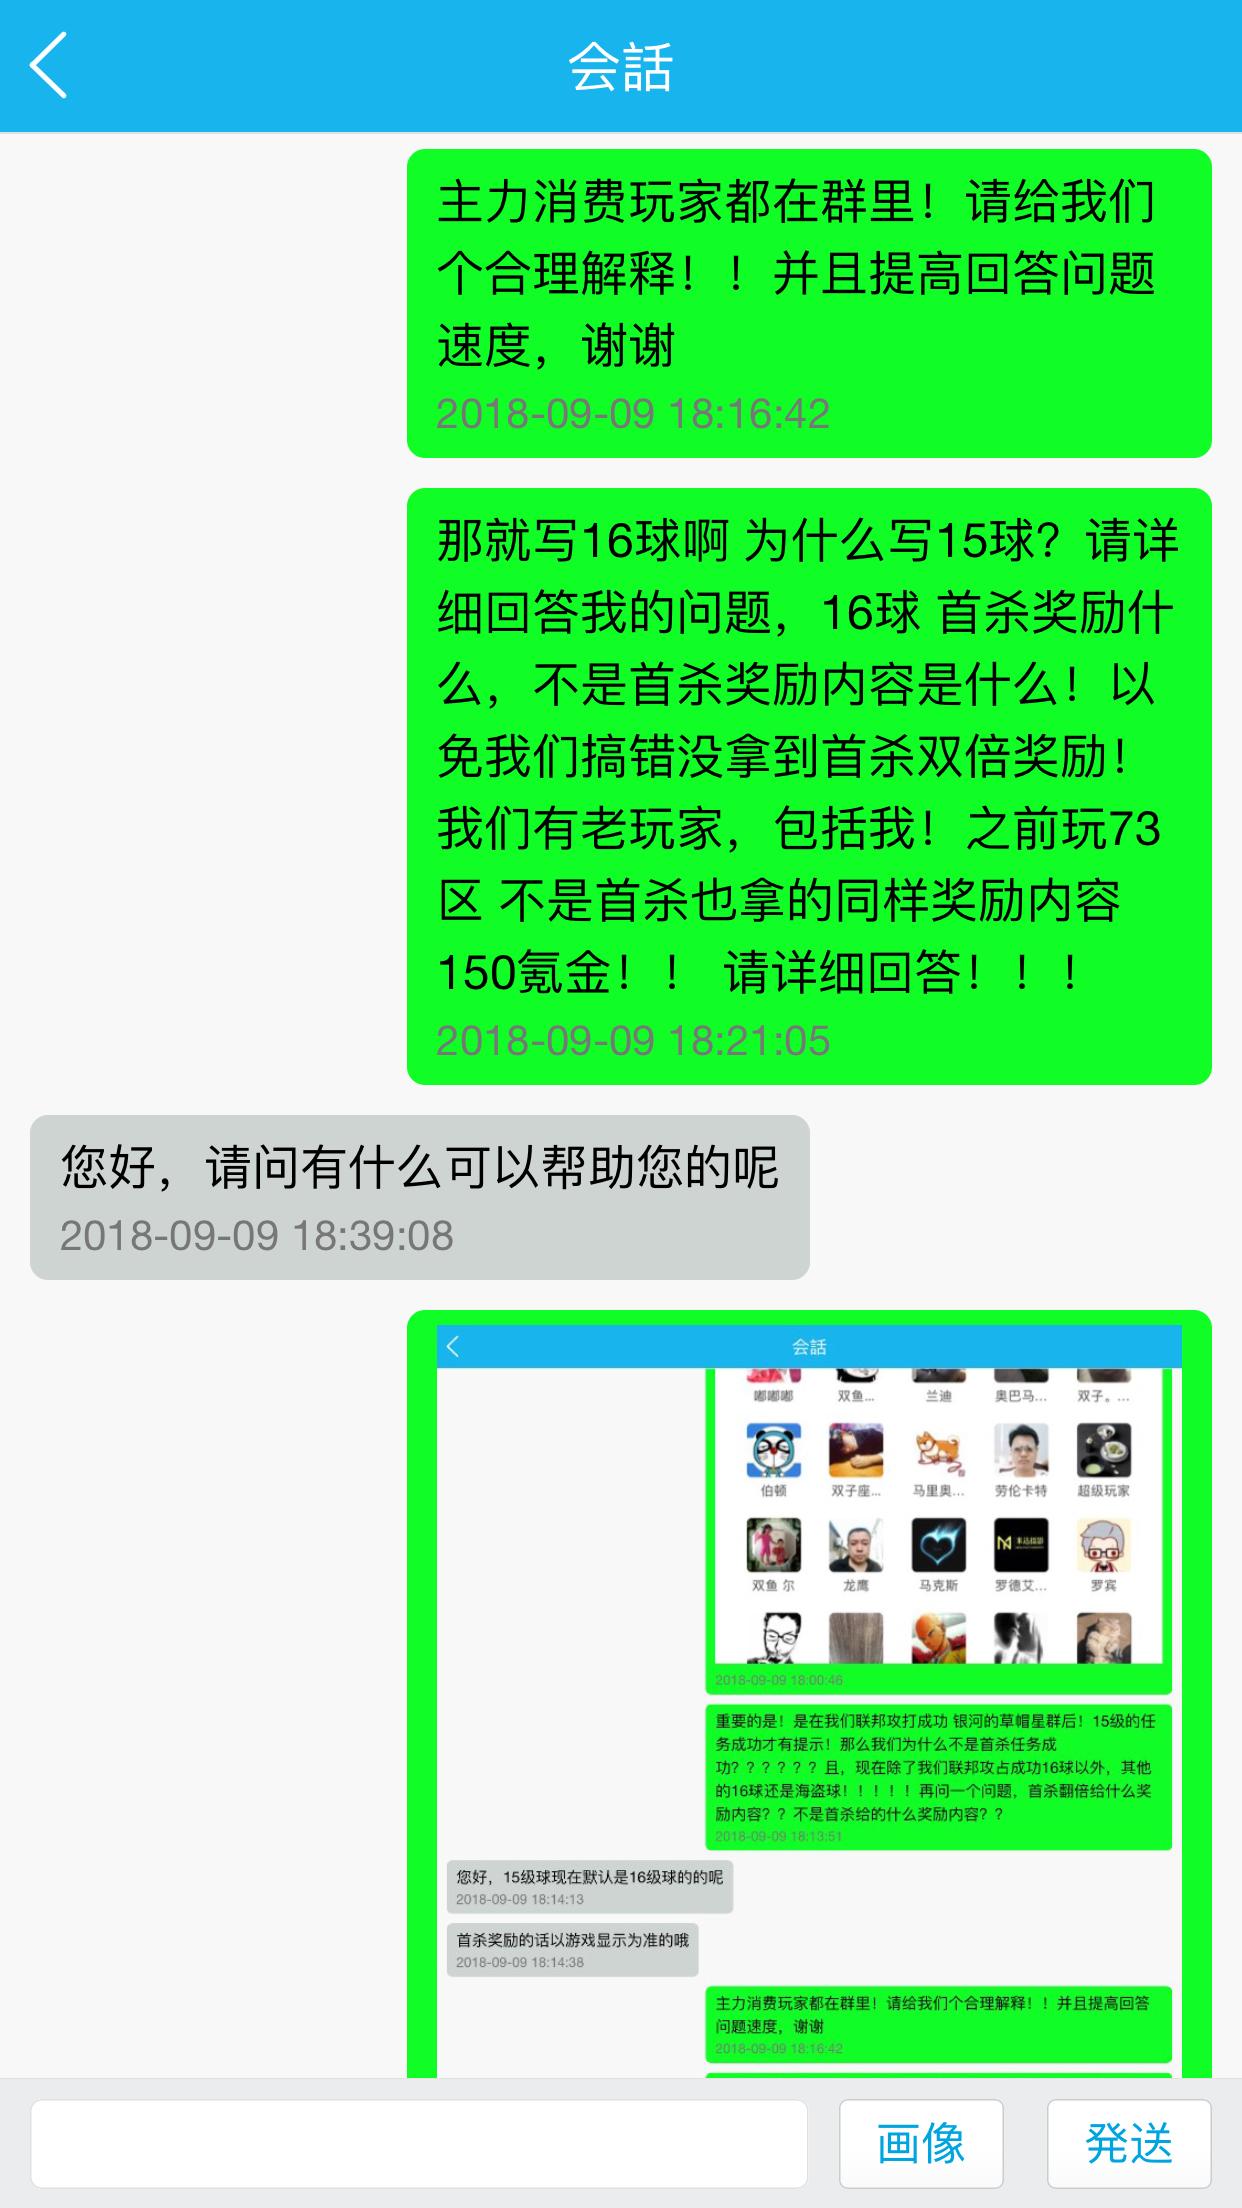 9049BCCB-3B69-461A-81DE-076547E57C56.png